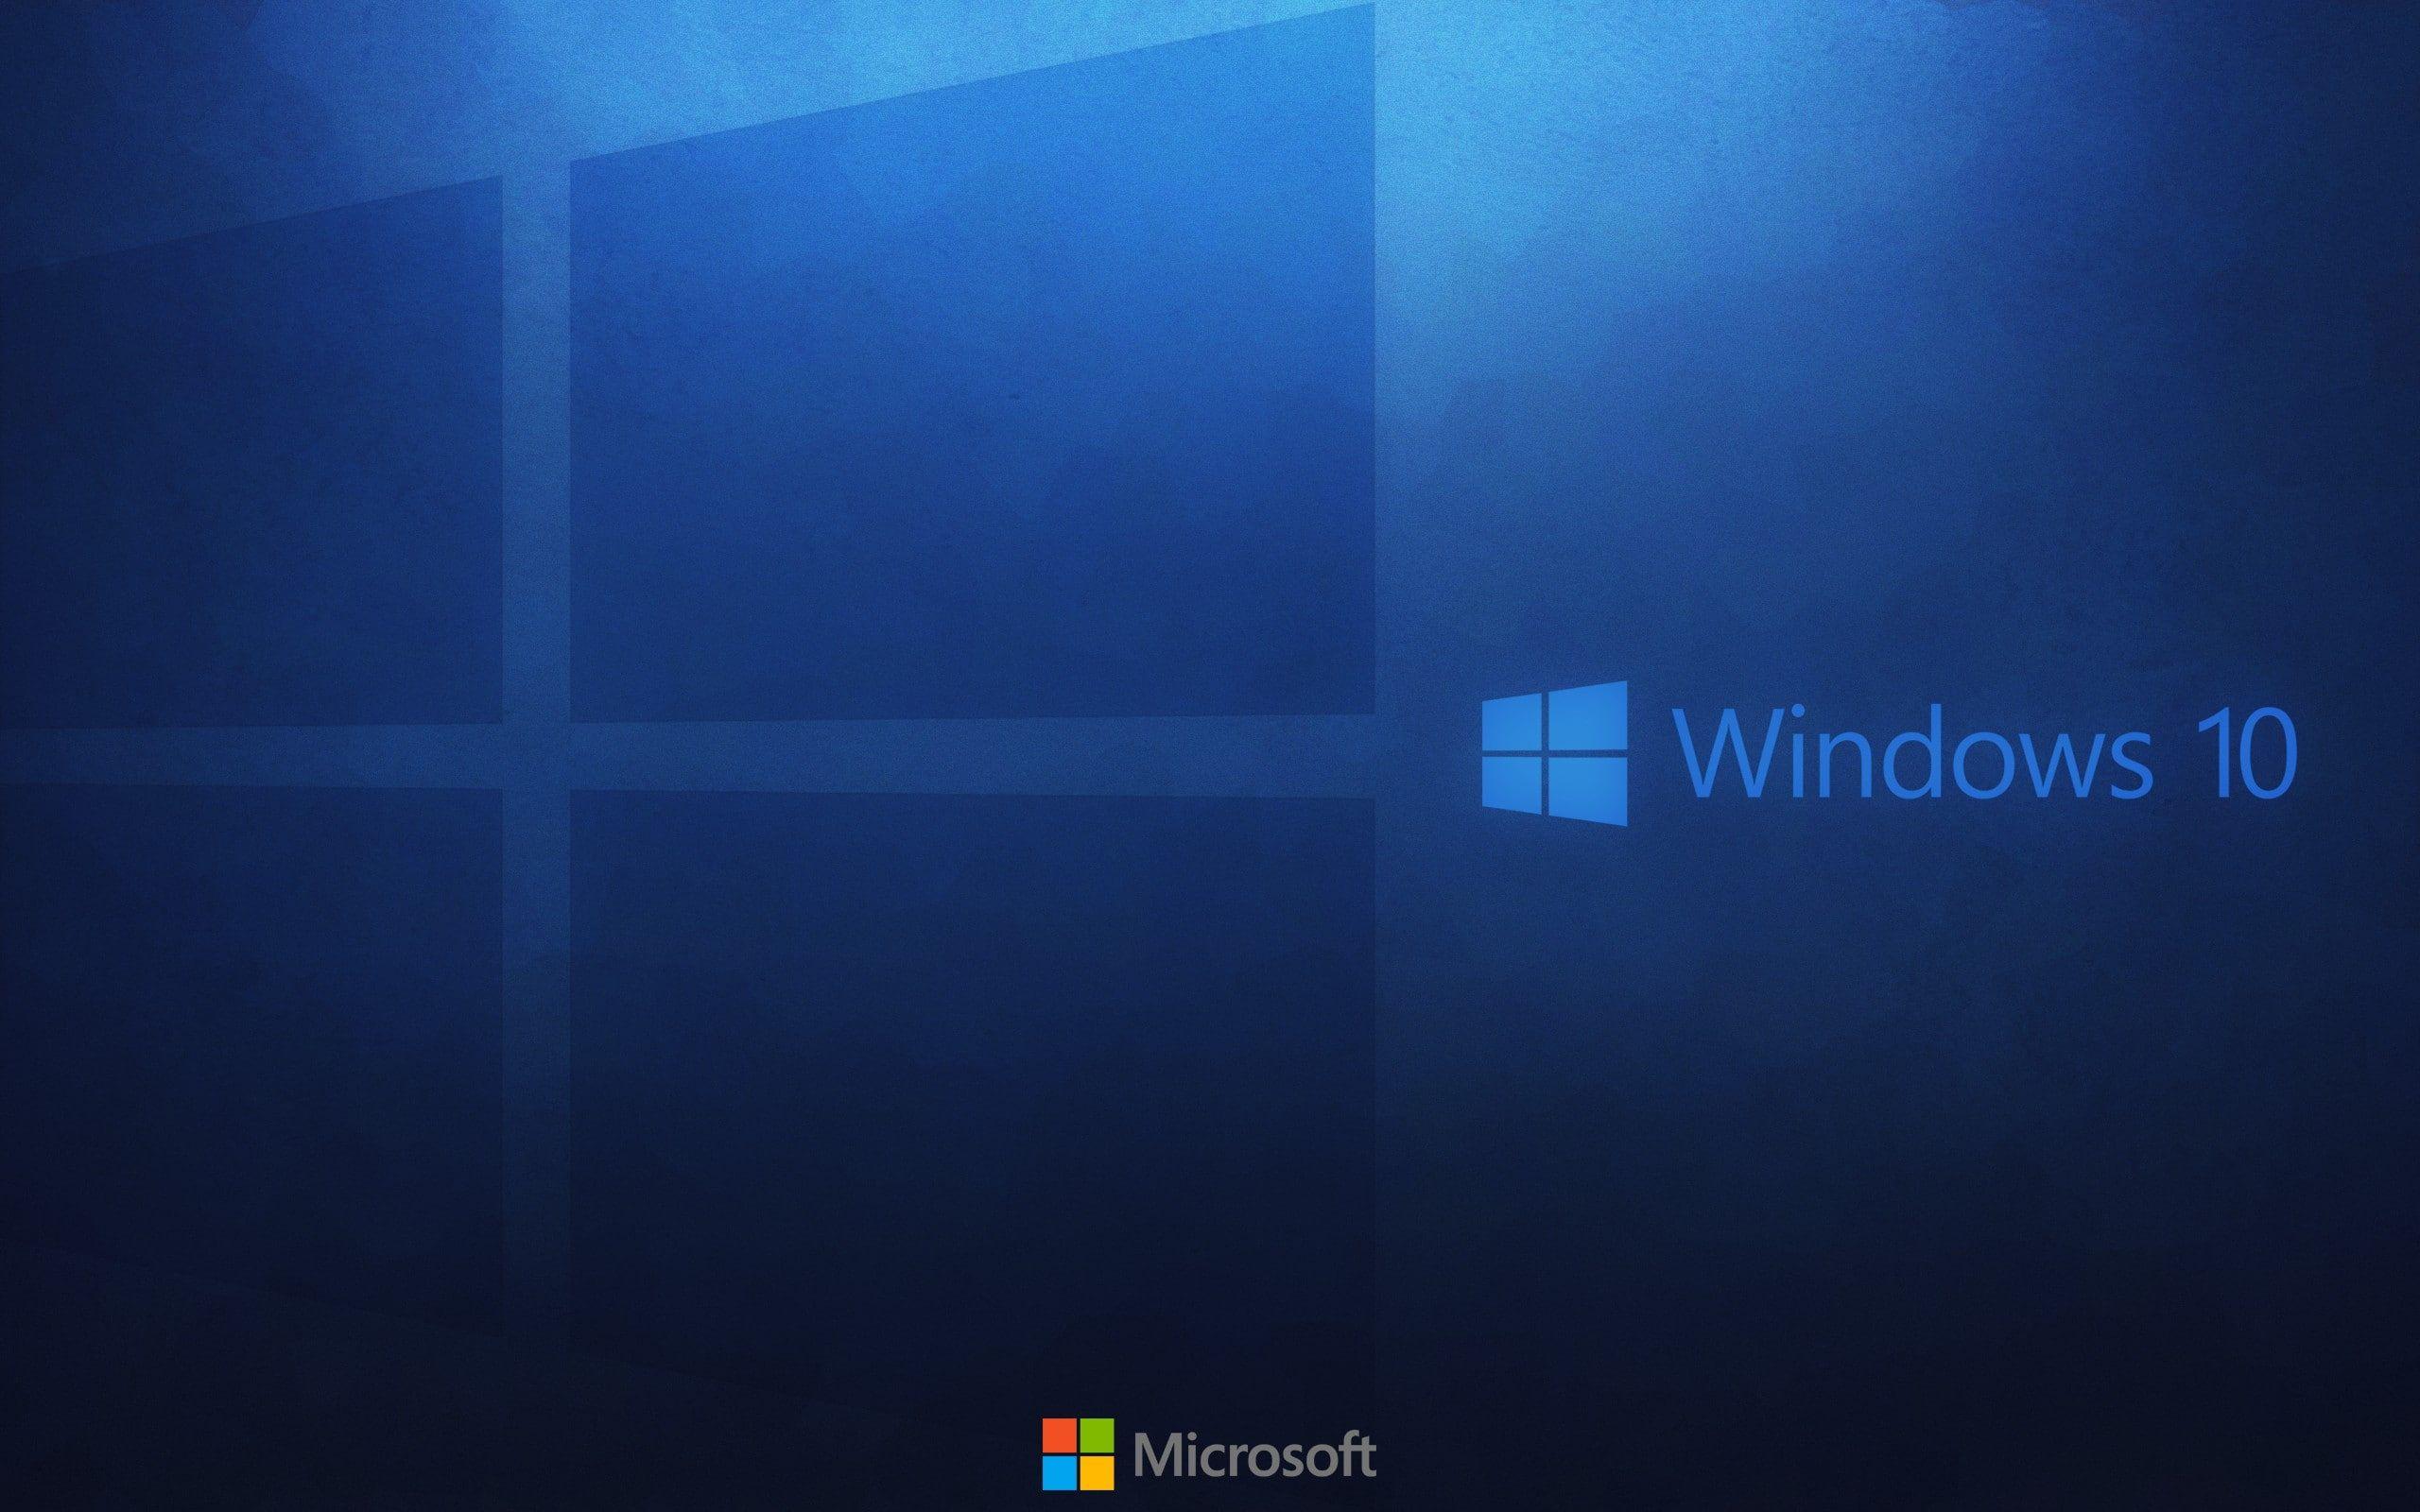 Windows 10 Logo Microsoft Windows 10 Windows 10 Hi Tech Windose Microsoft Logo Operating Sys In 2020 Wallpaper Windows 10 Windows Wallpaper Windows 10 Microsoft